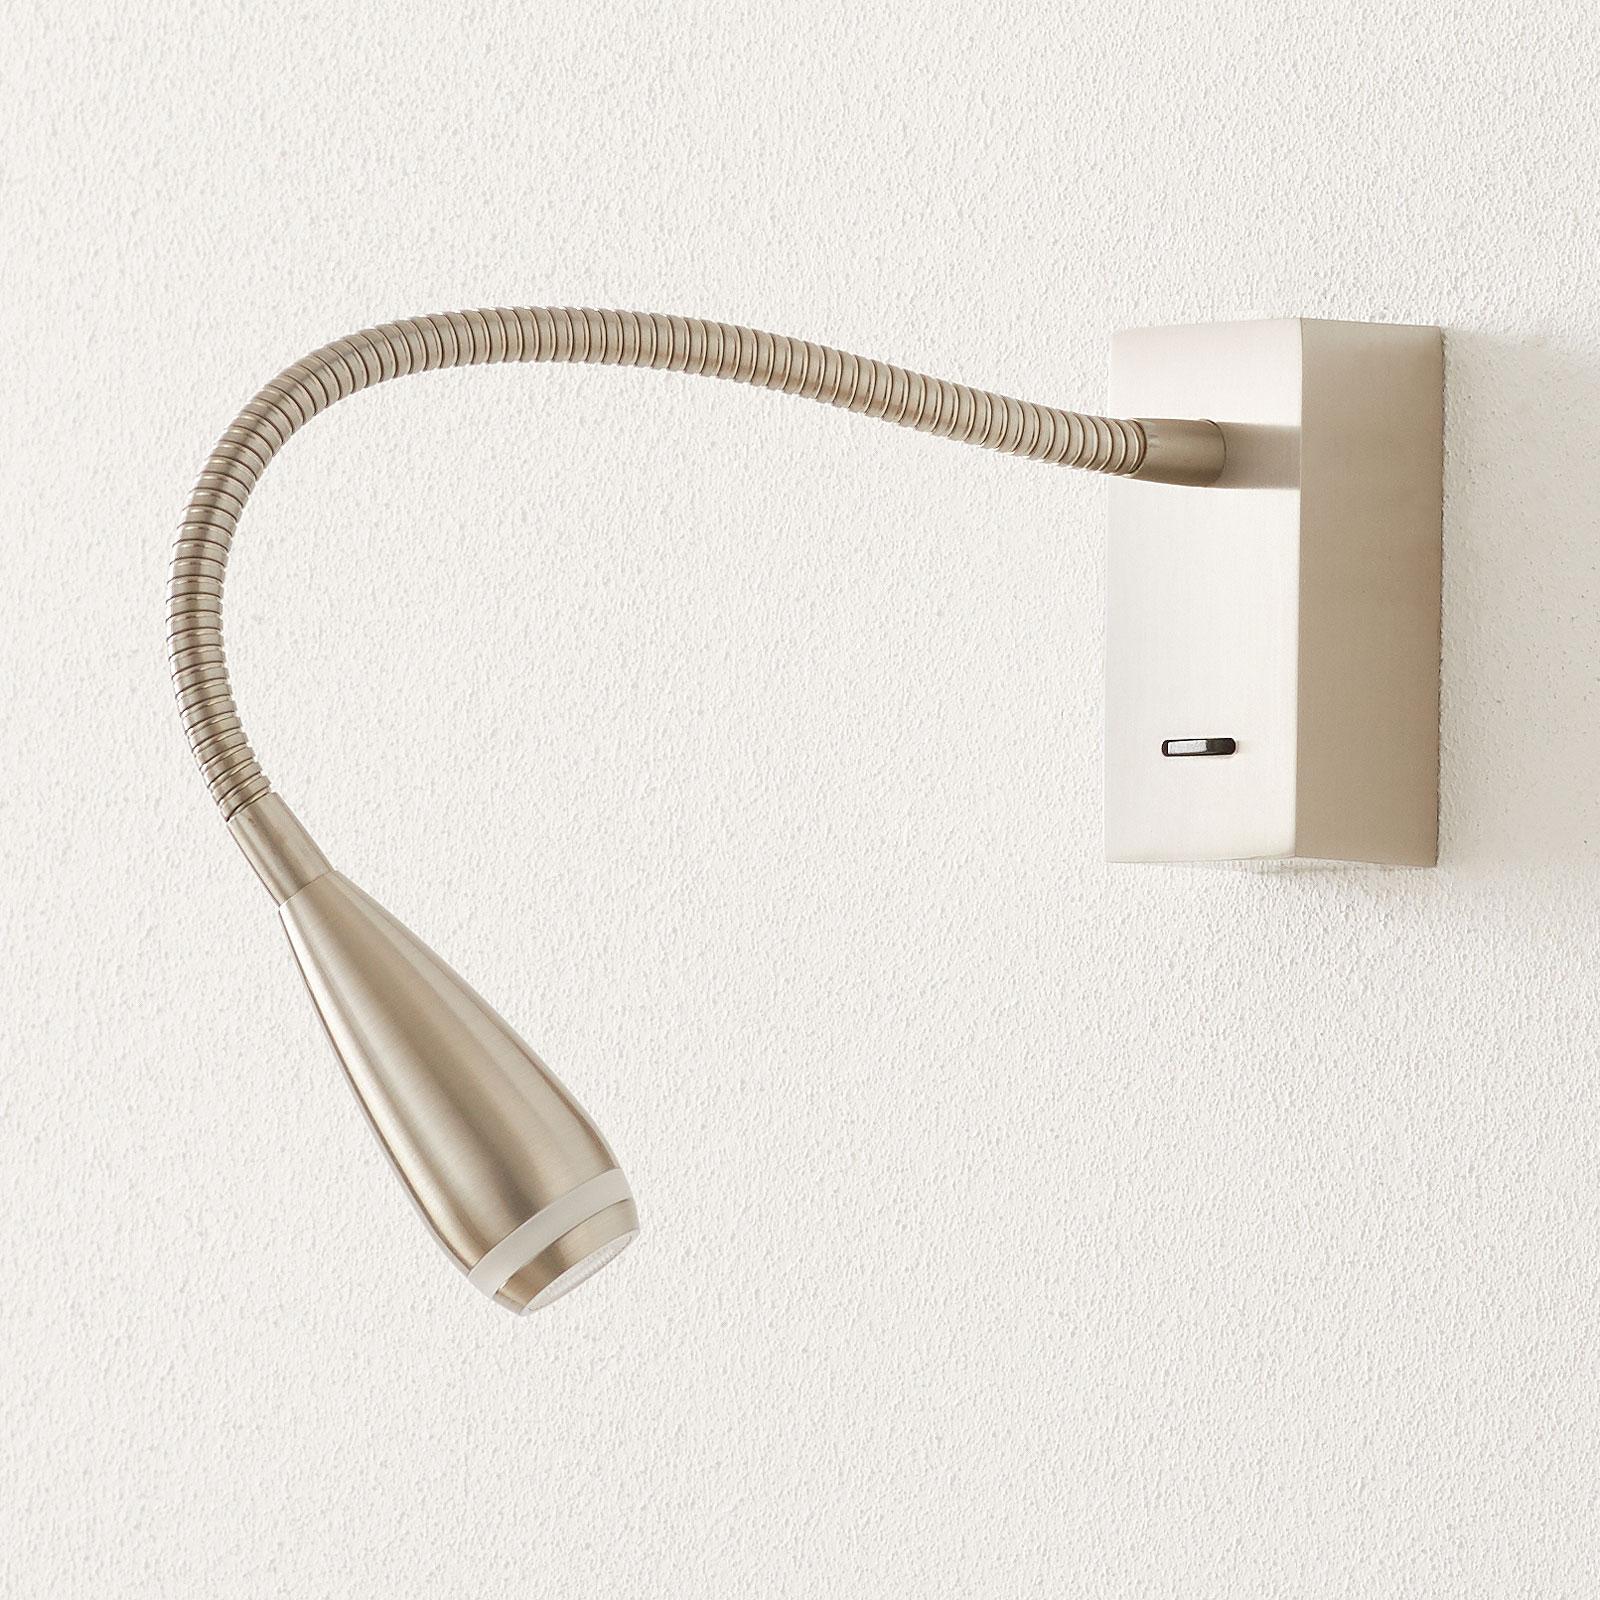 LED-Wandleuchte Clik mit Schalter, nickel matt